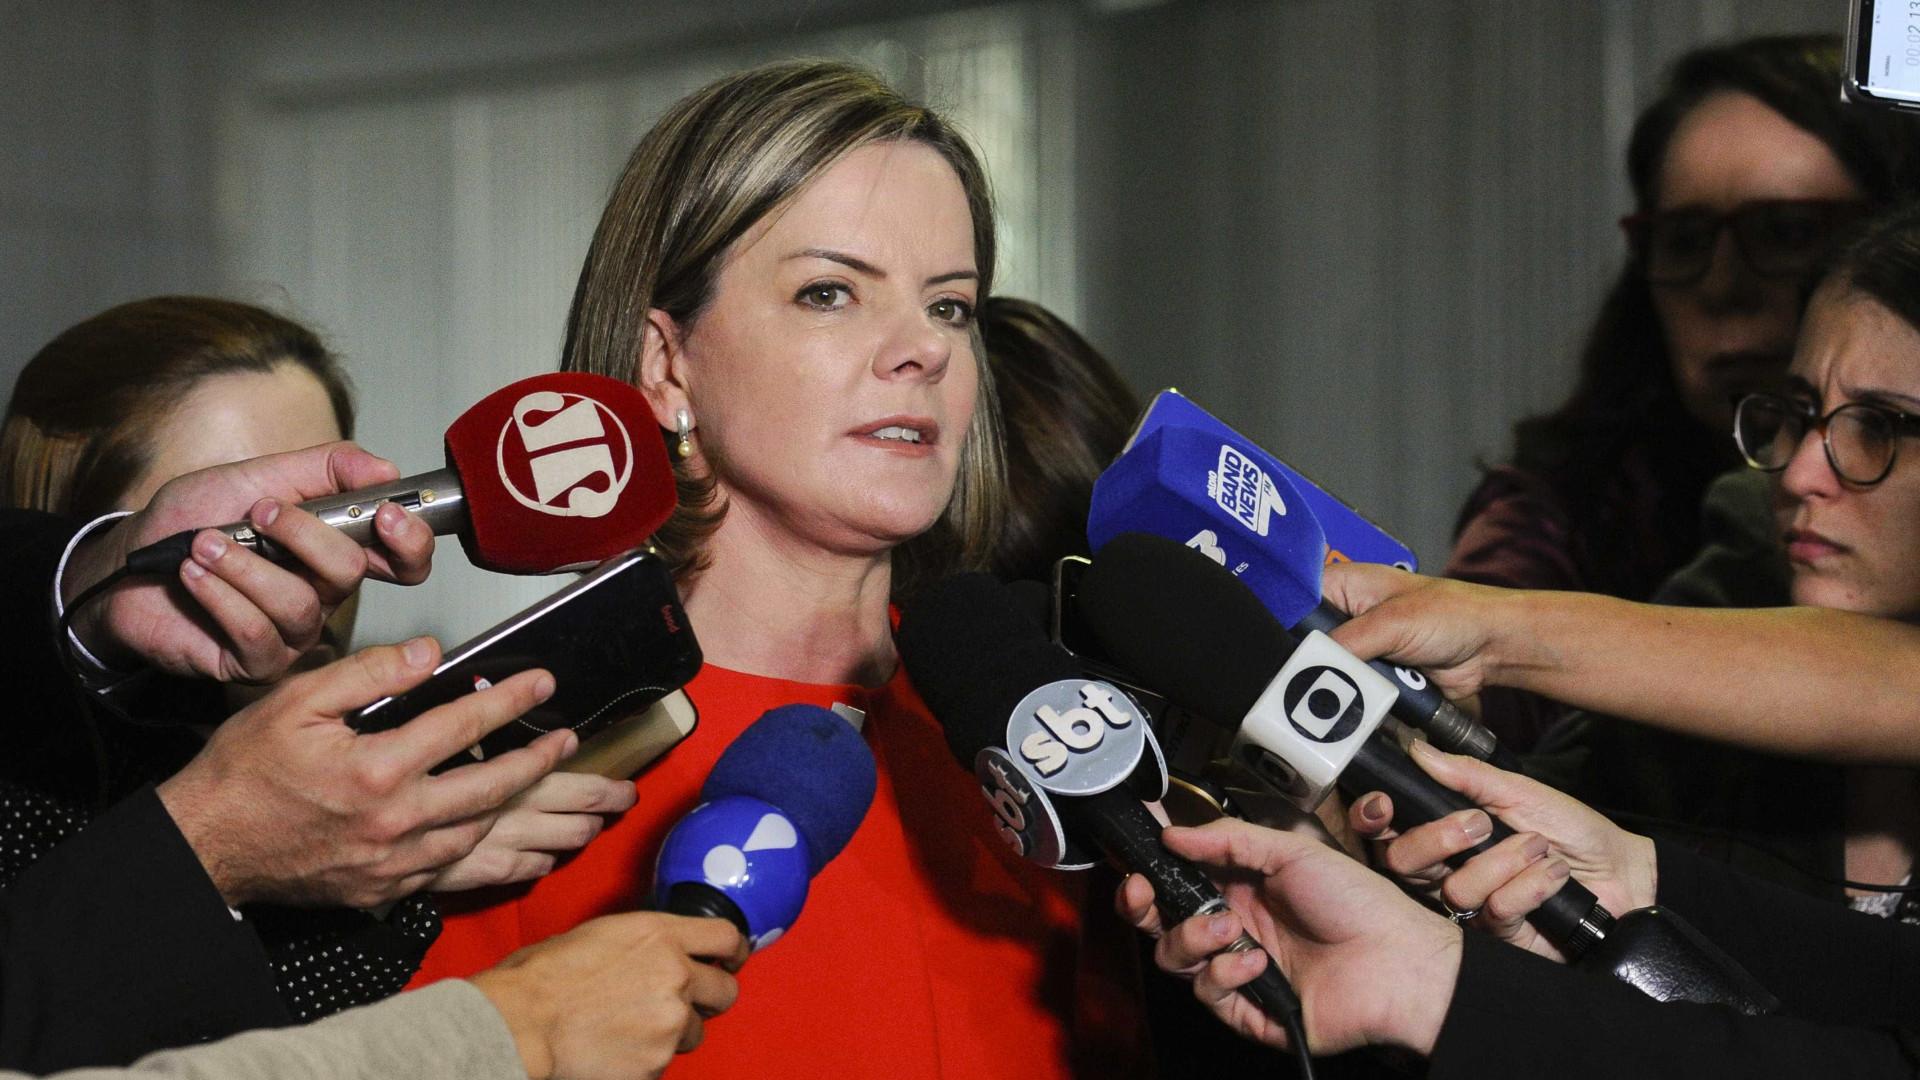 Para prender Lula 'vai ter que matar gente', diz Gleisi a site